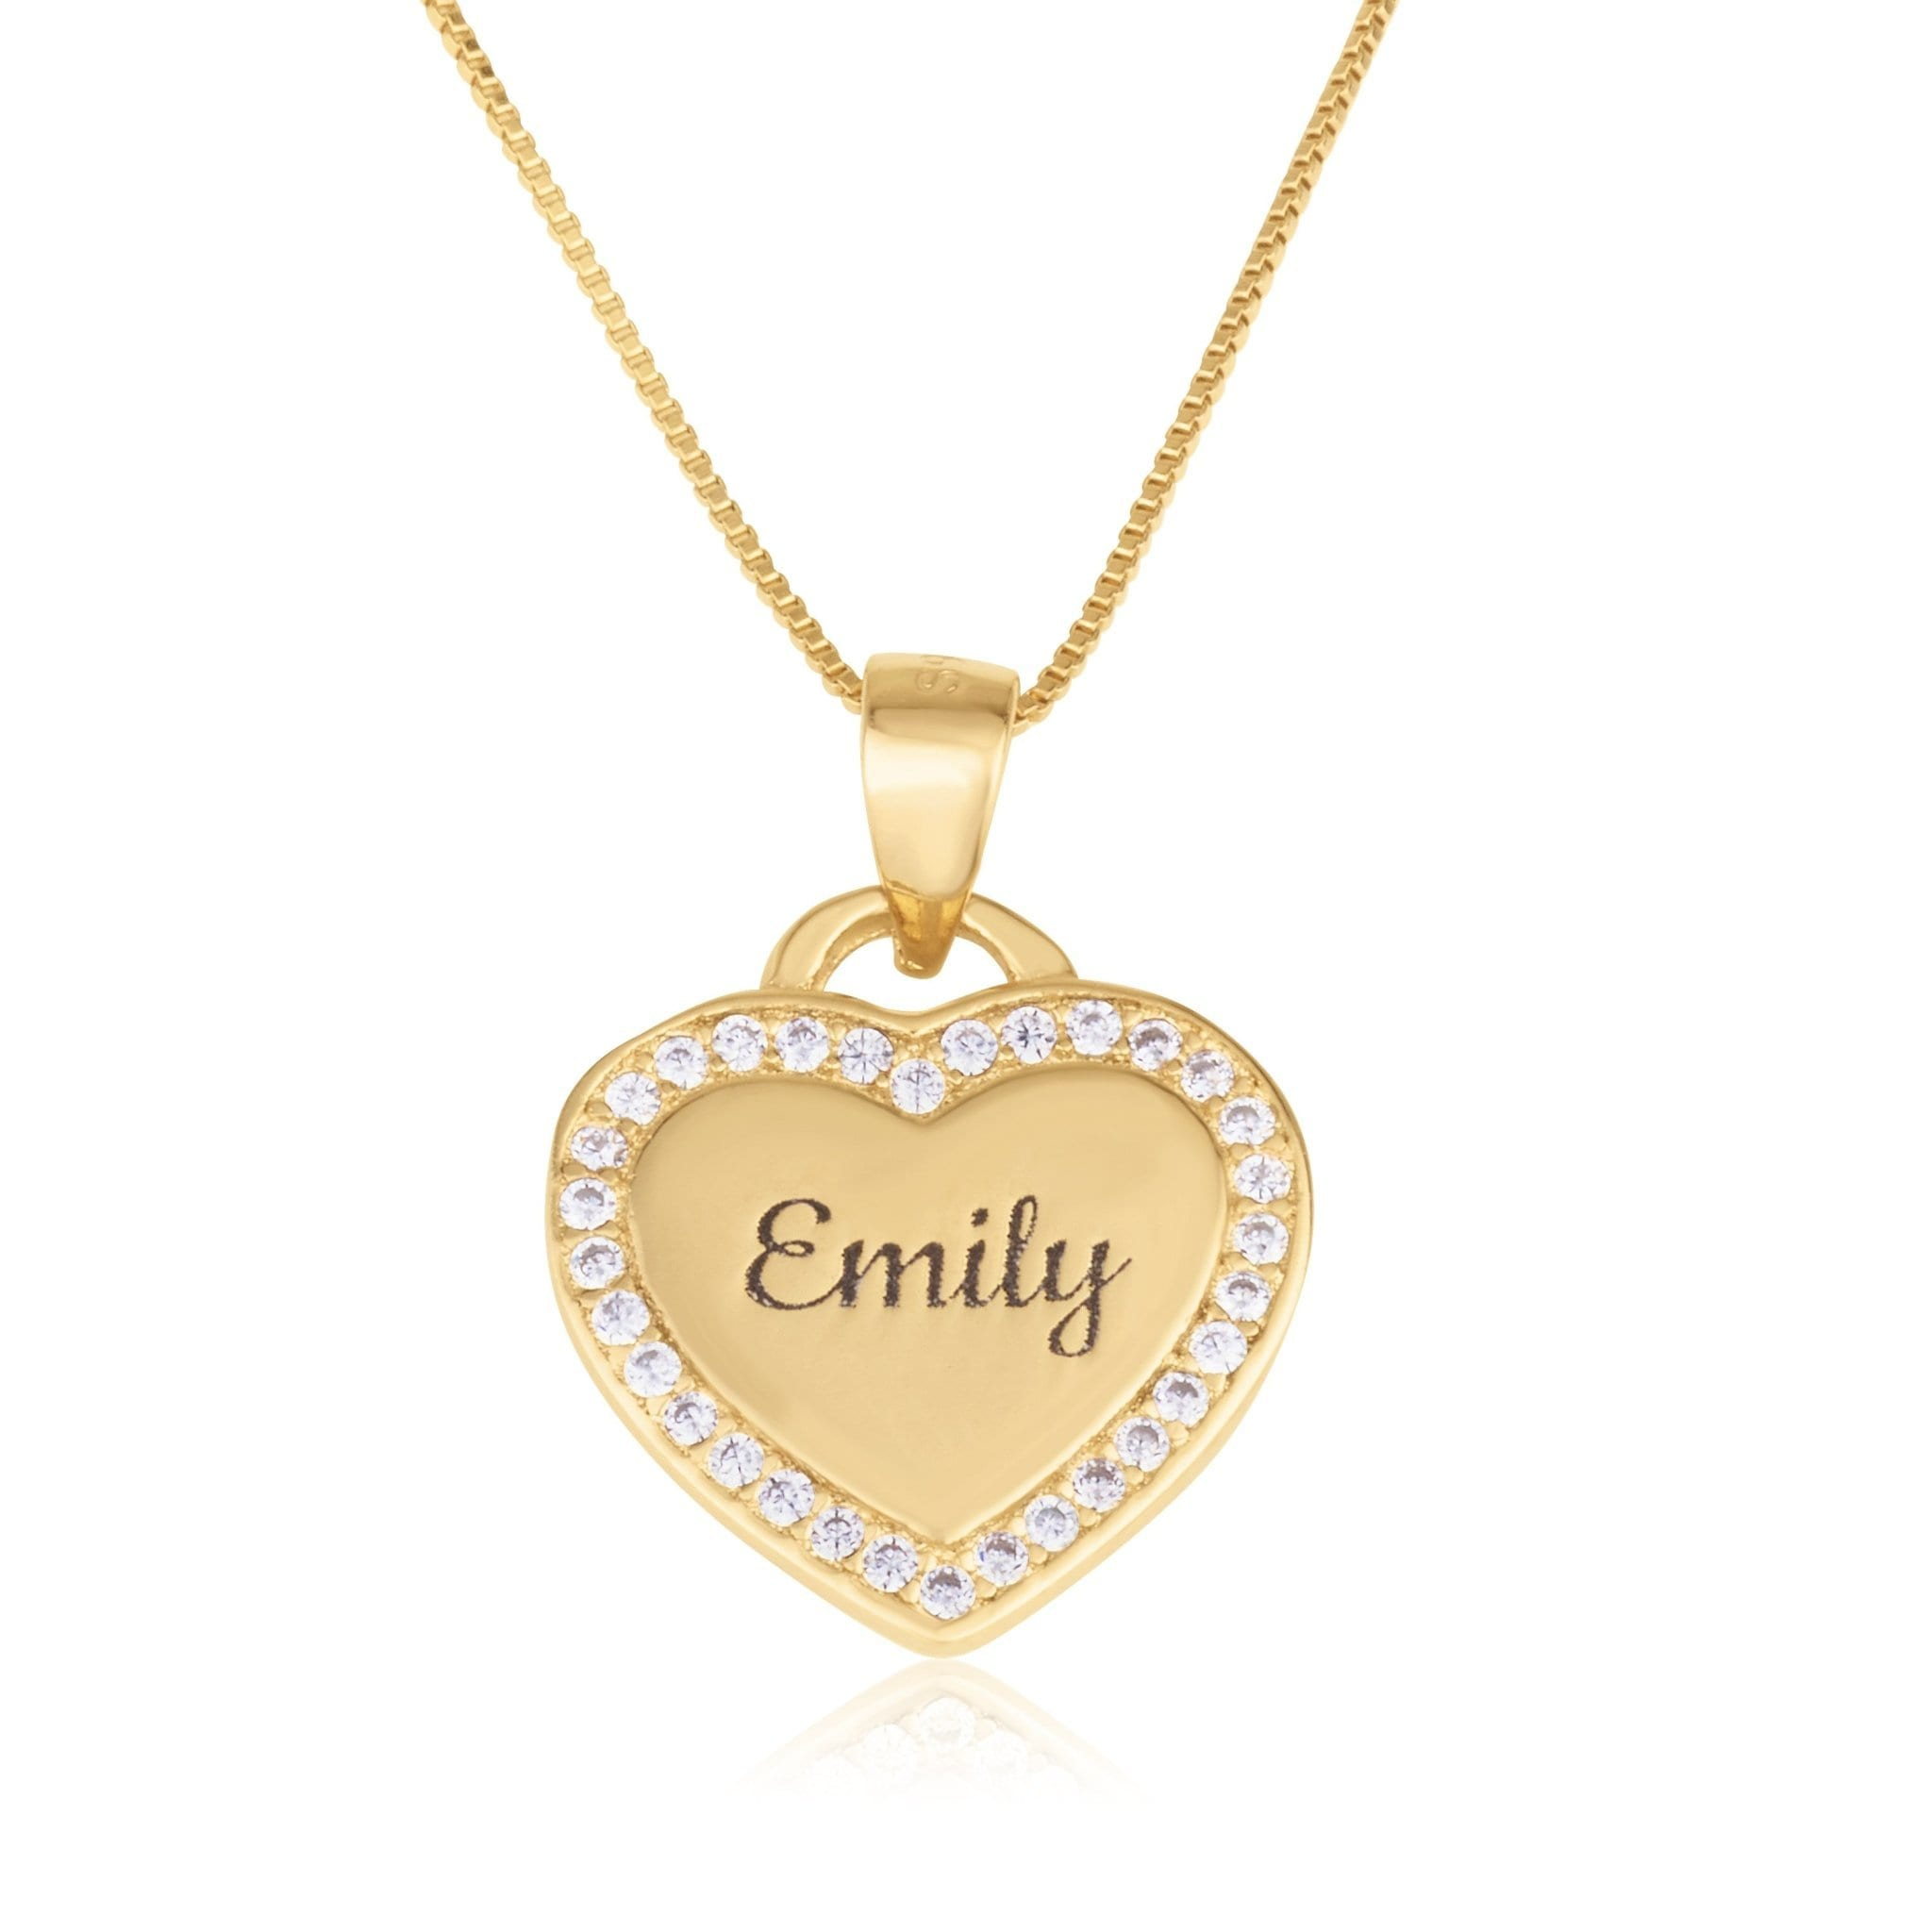 Zirkon Heart Pendant With Engraved Name - Beleco Jewelry